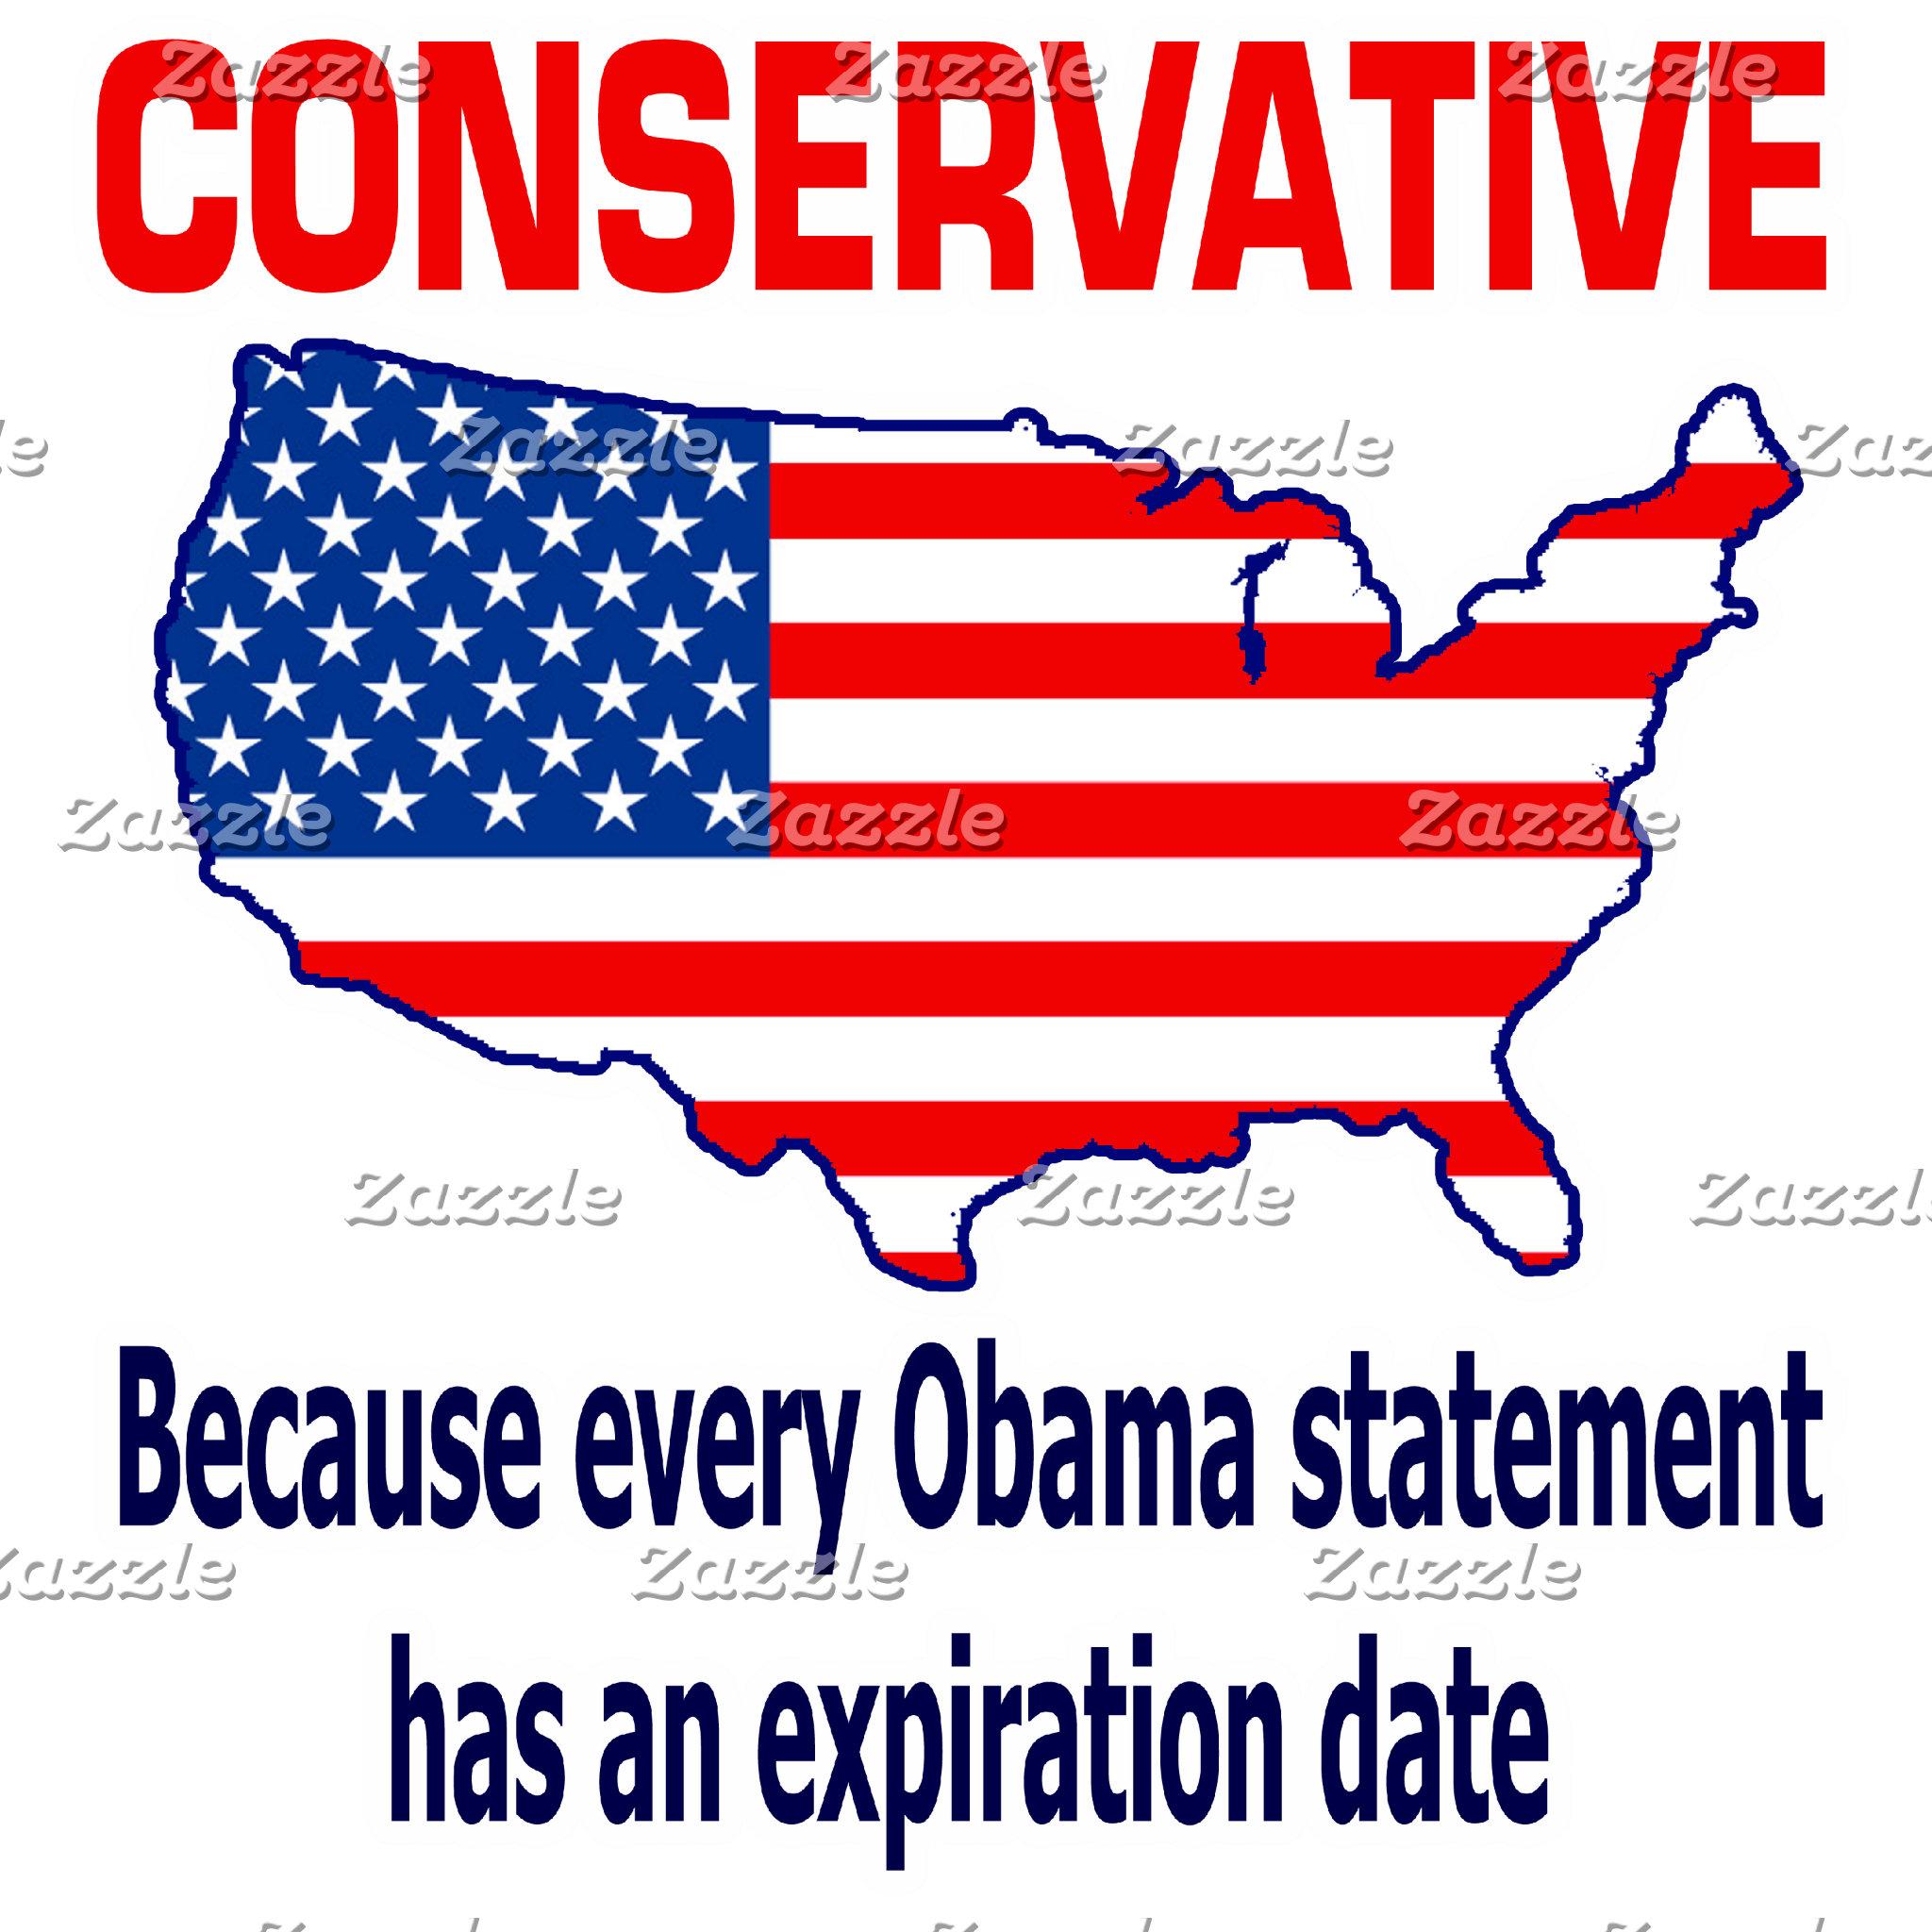 Conservative Expiration Date